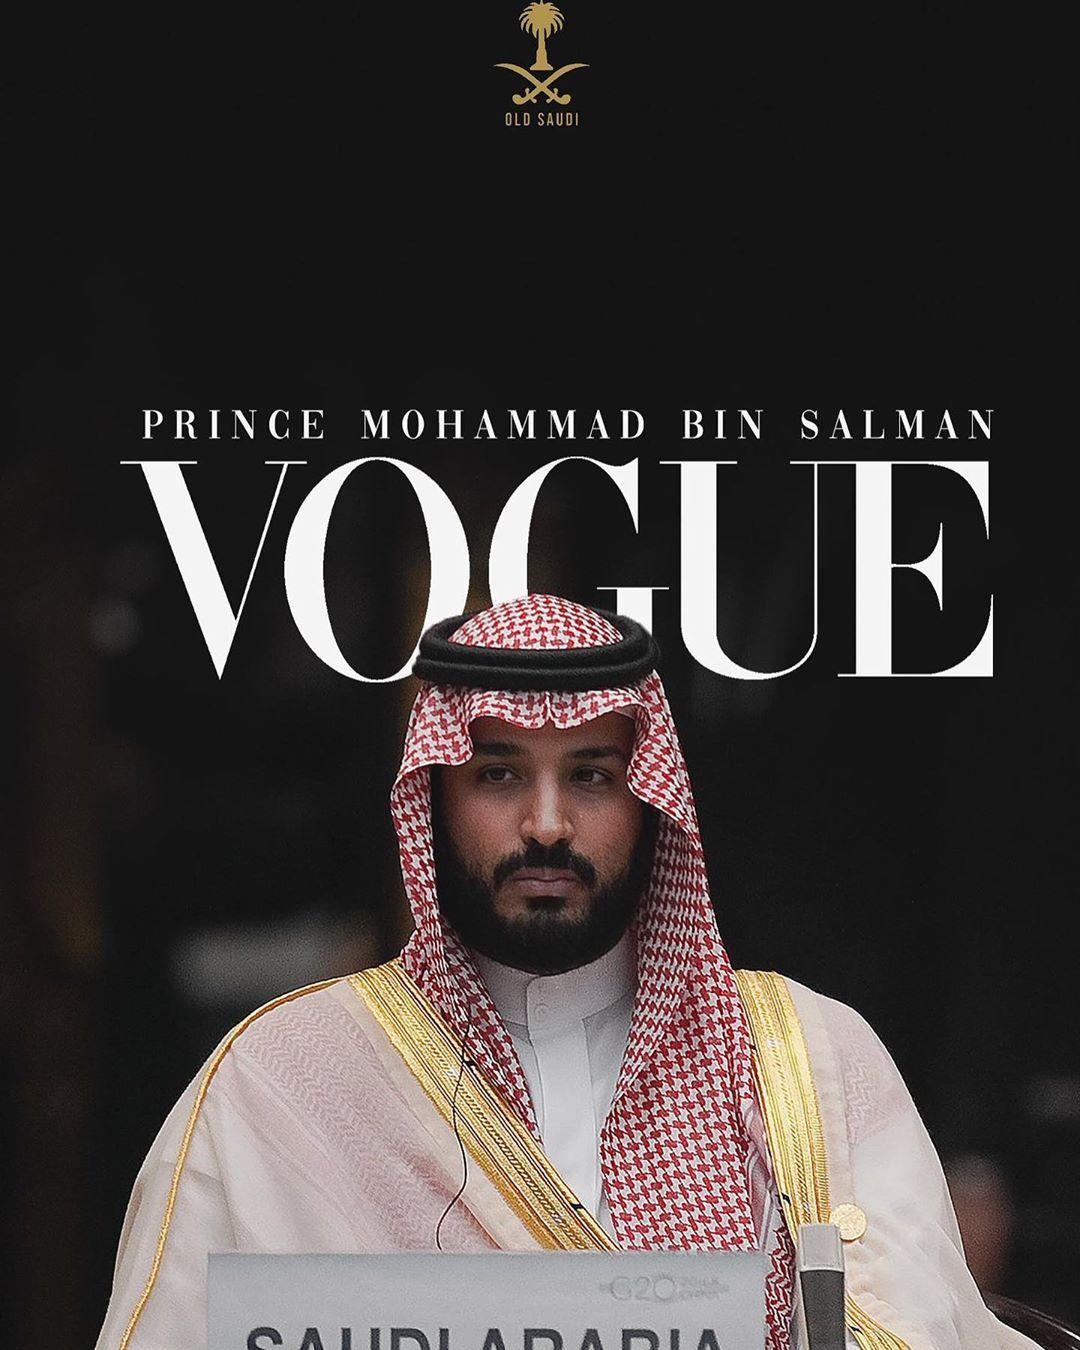 Old Saudi On Instagram Voguechallenge Olds Fashion Painting Wedding Prints